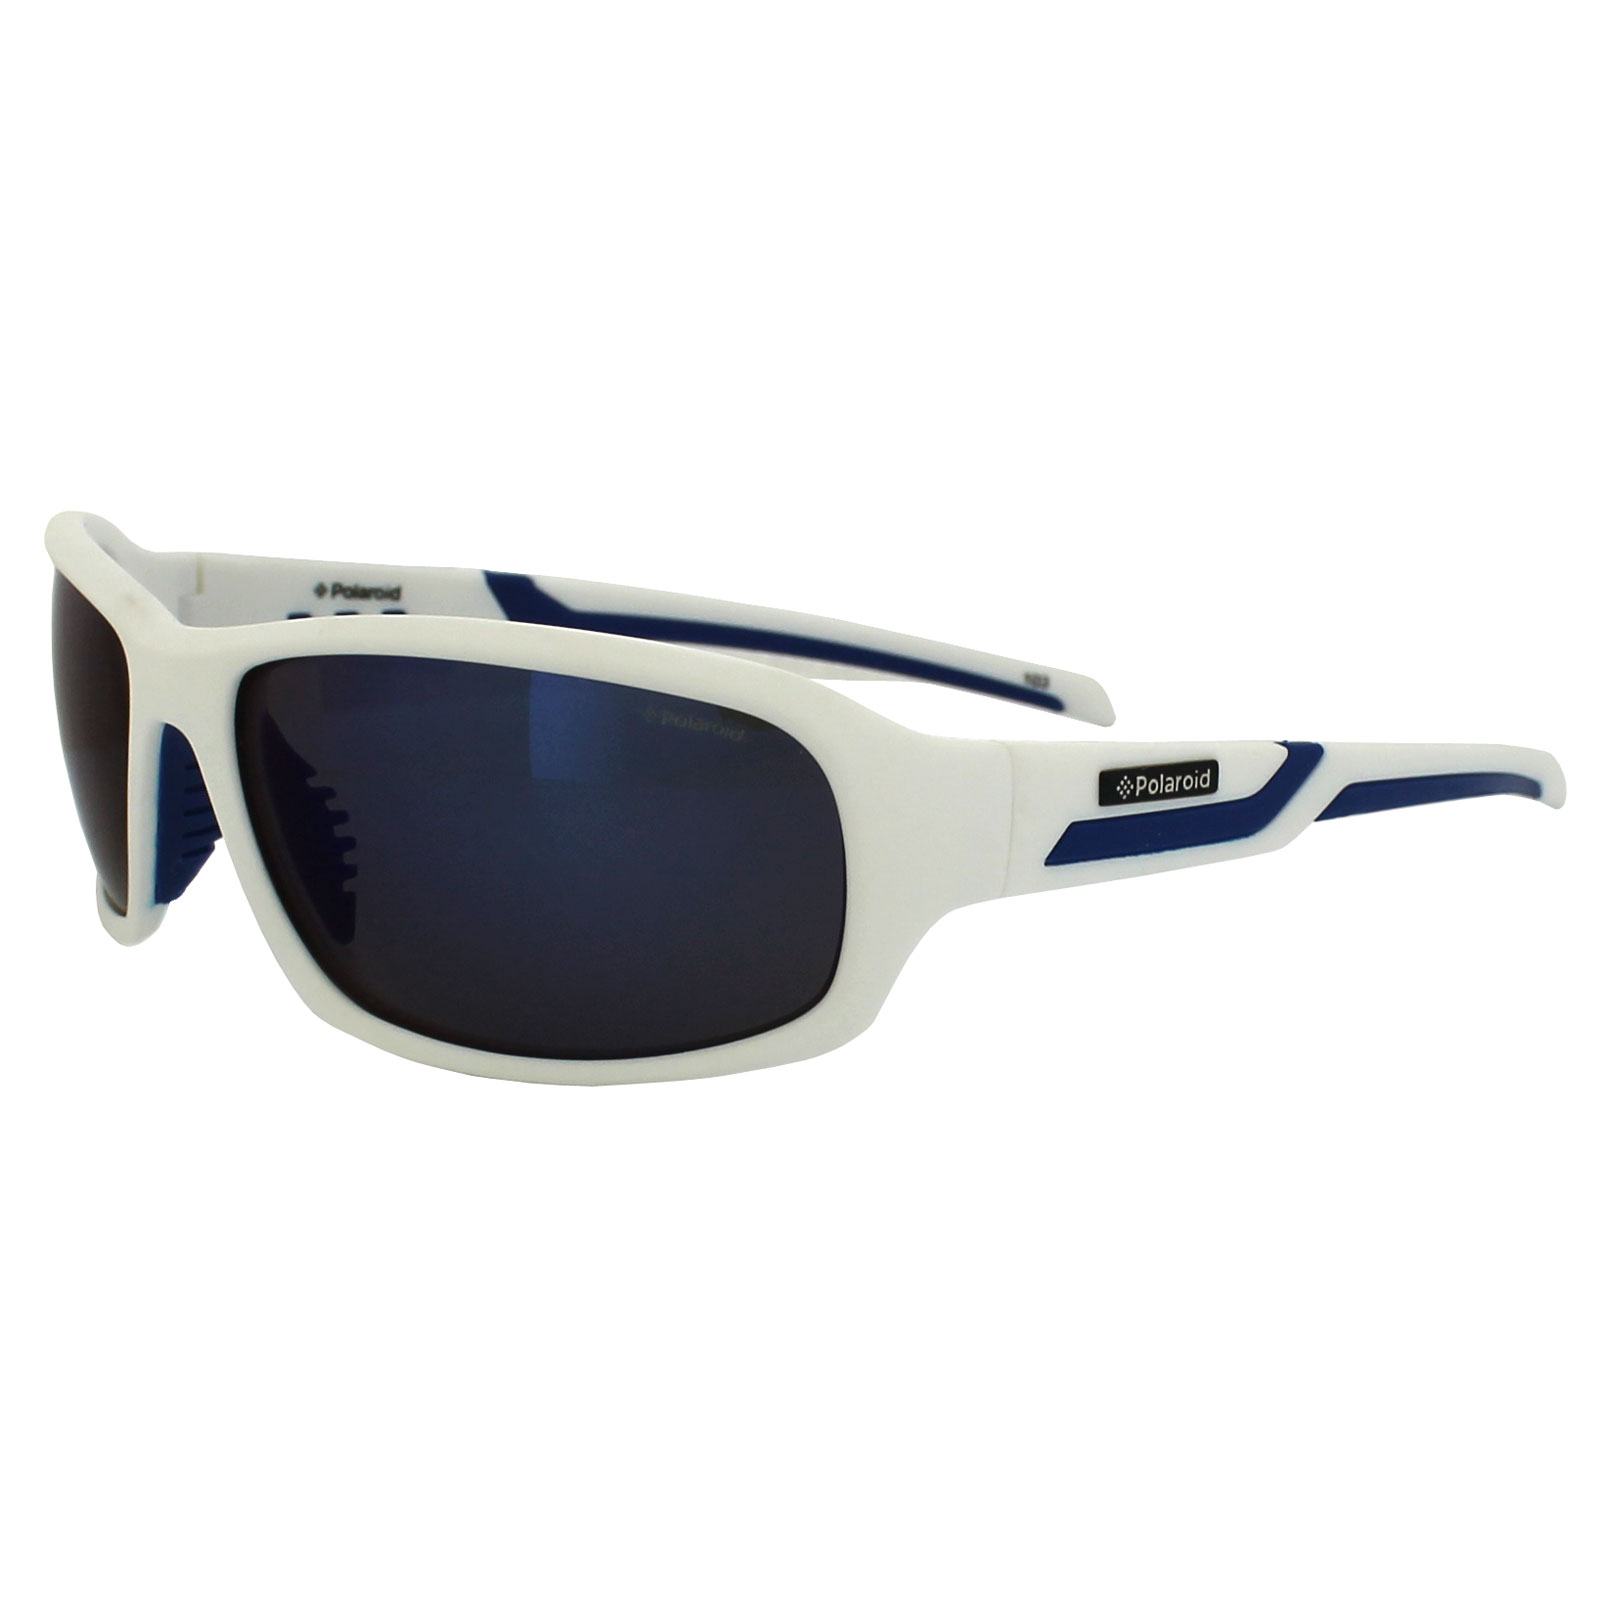 48b8c3aba10 Sentinel Polaroid Sport Sunglasses P7406 22J JY White   Blue Grey Blue  Mirror Polarized